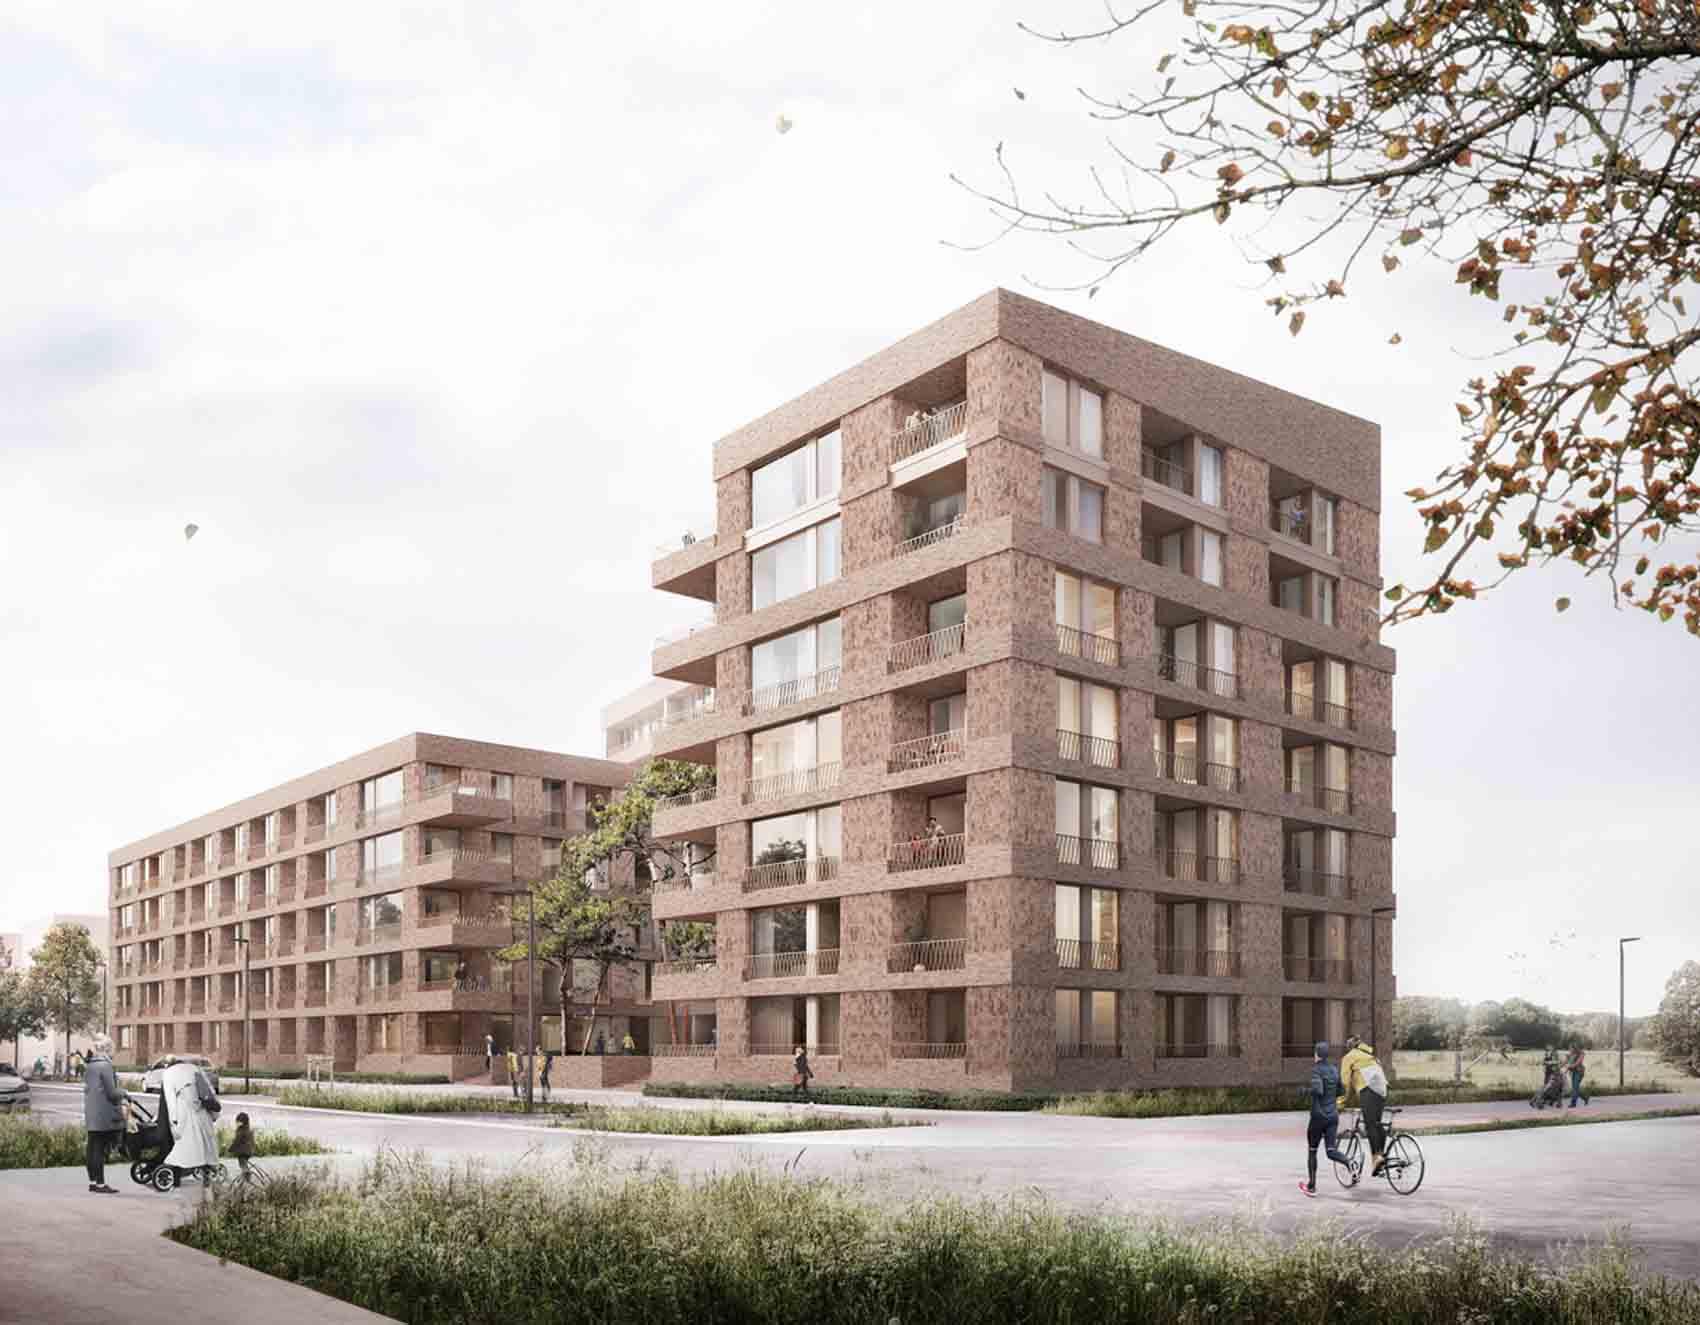 Lorenzen Mayer Architekten Berlin Kopenhagen